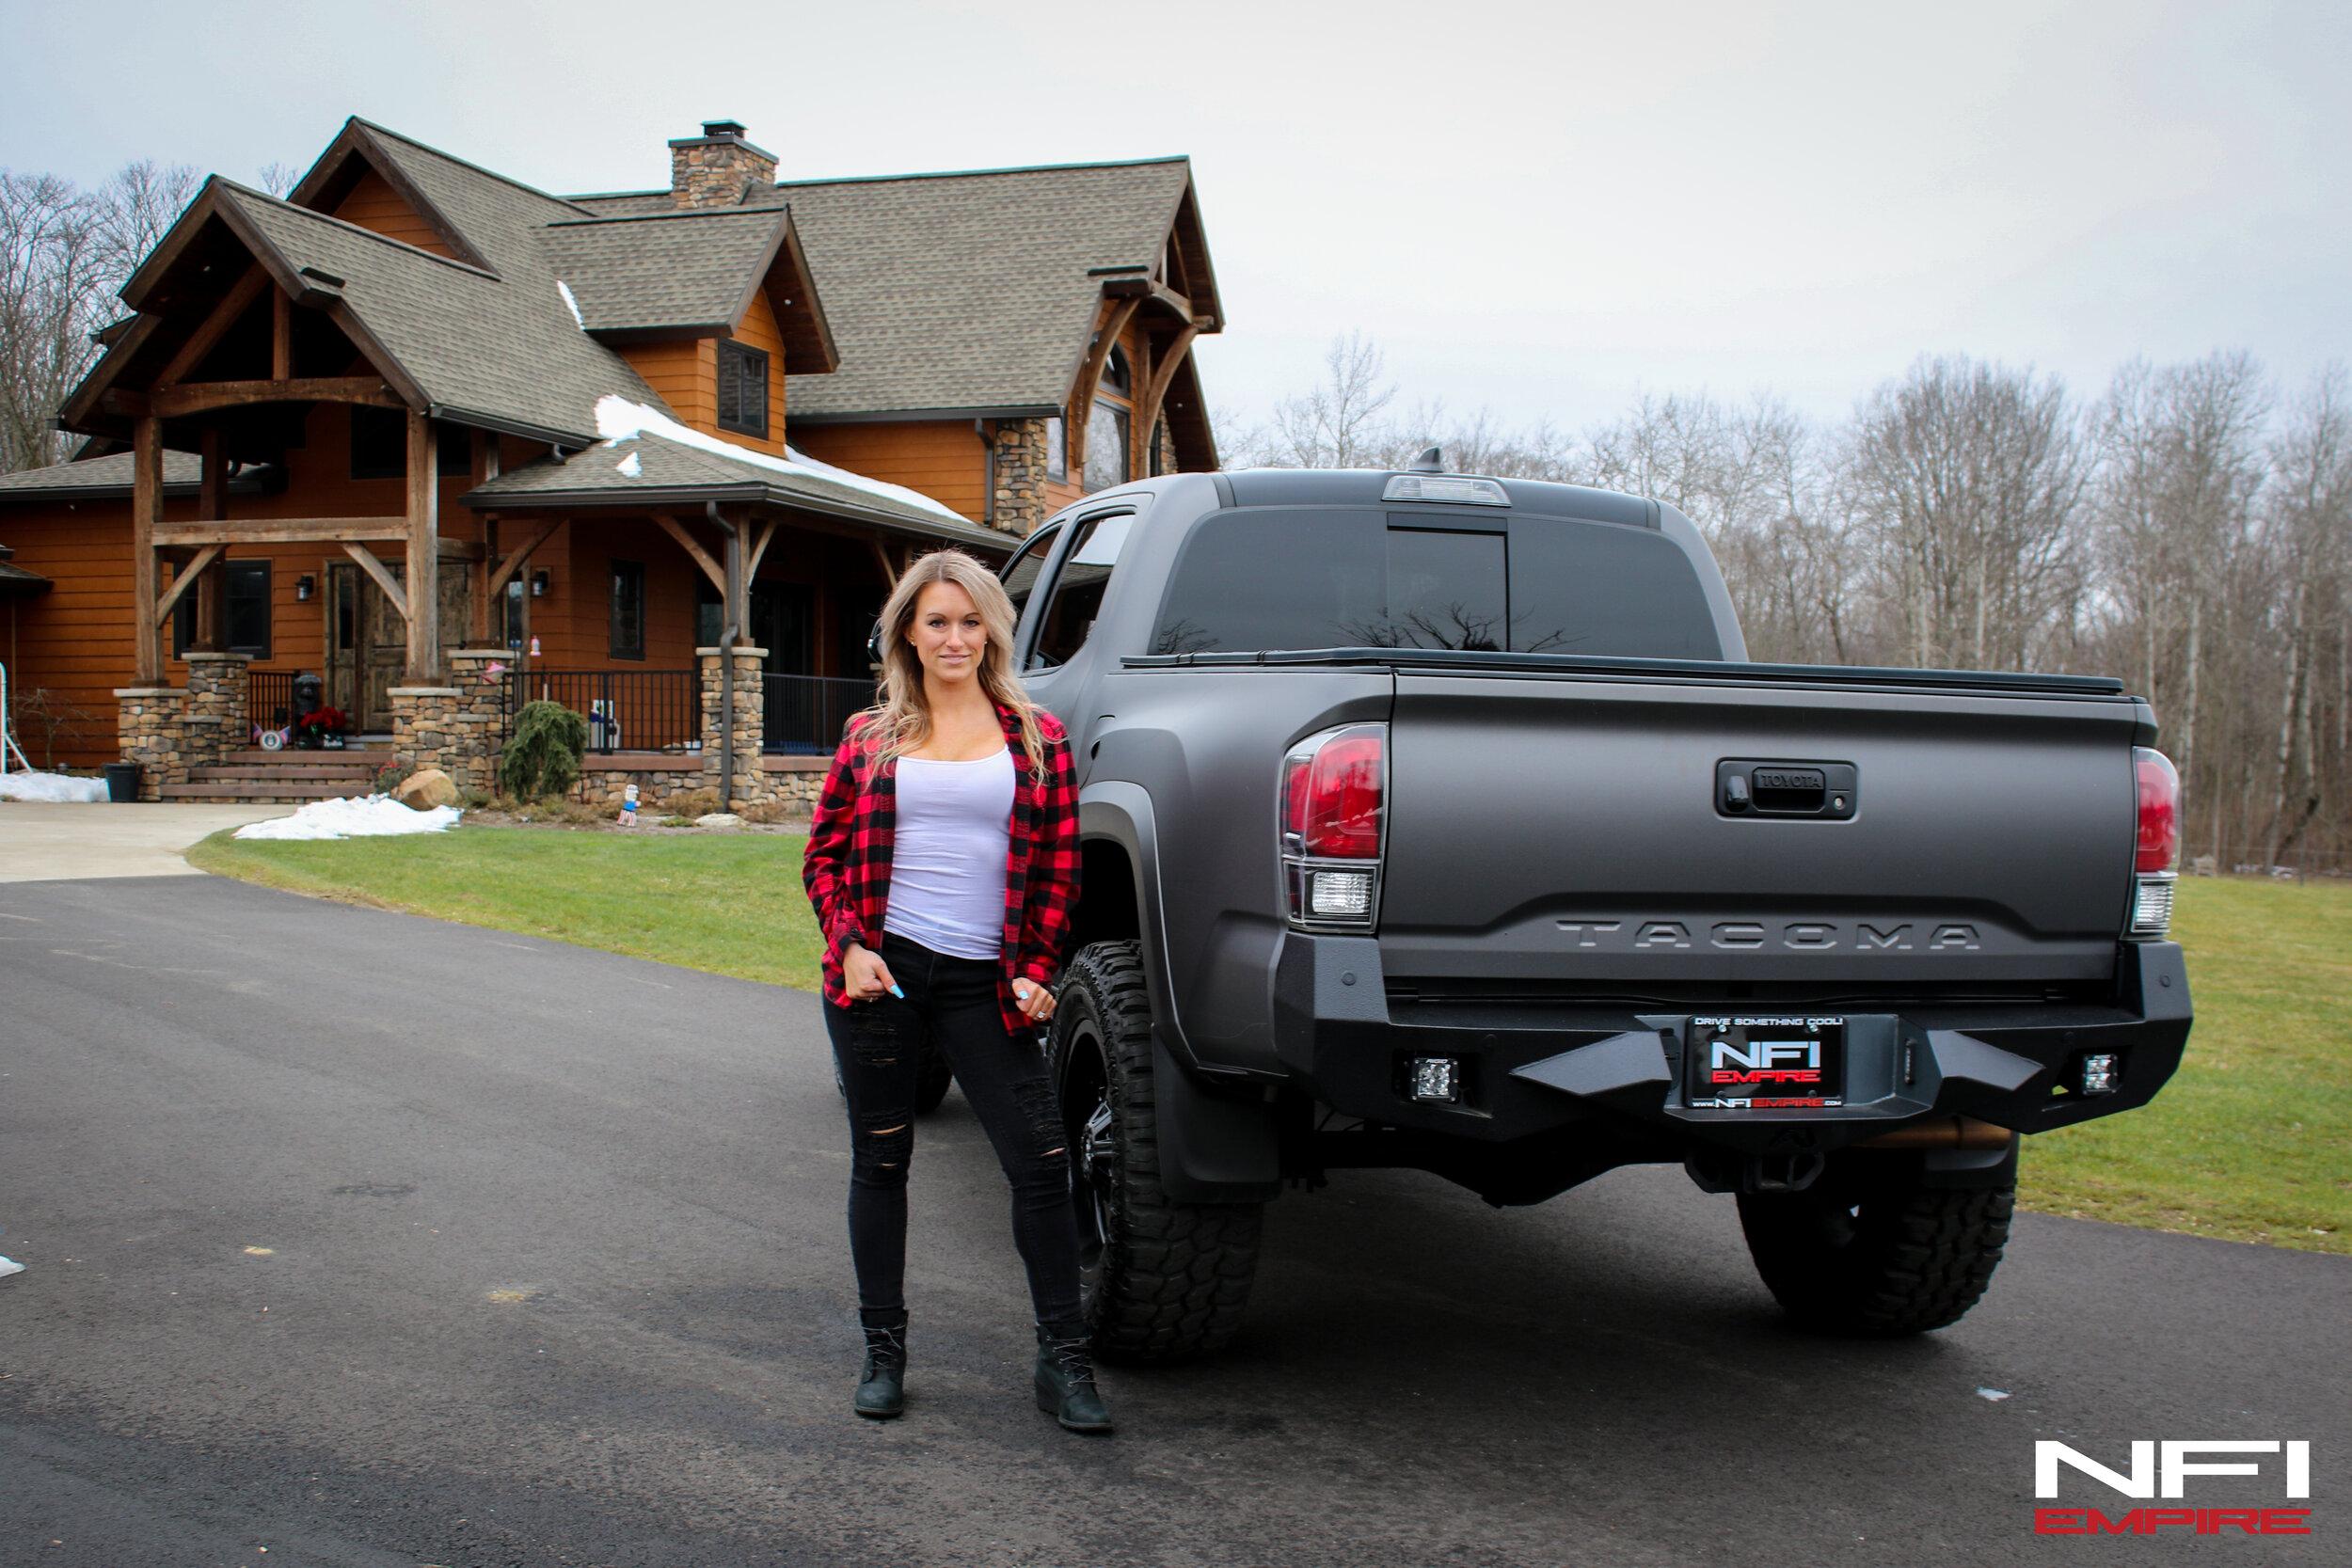 2018 Toyota Tacoma Lifted